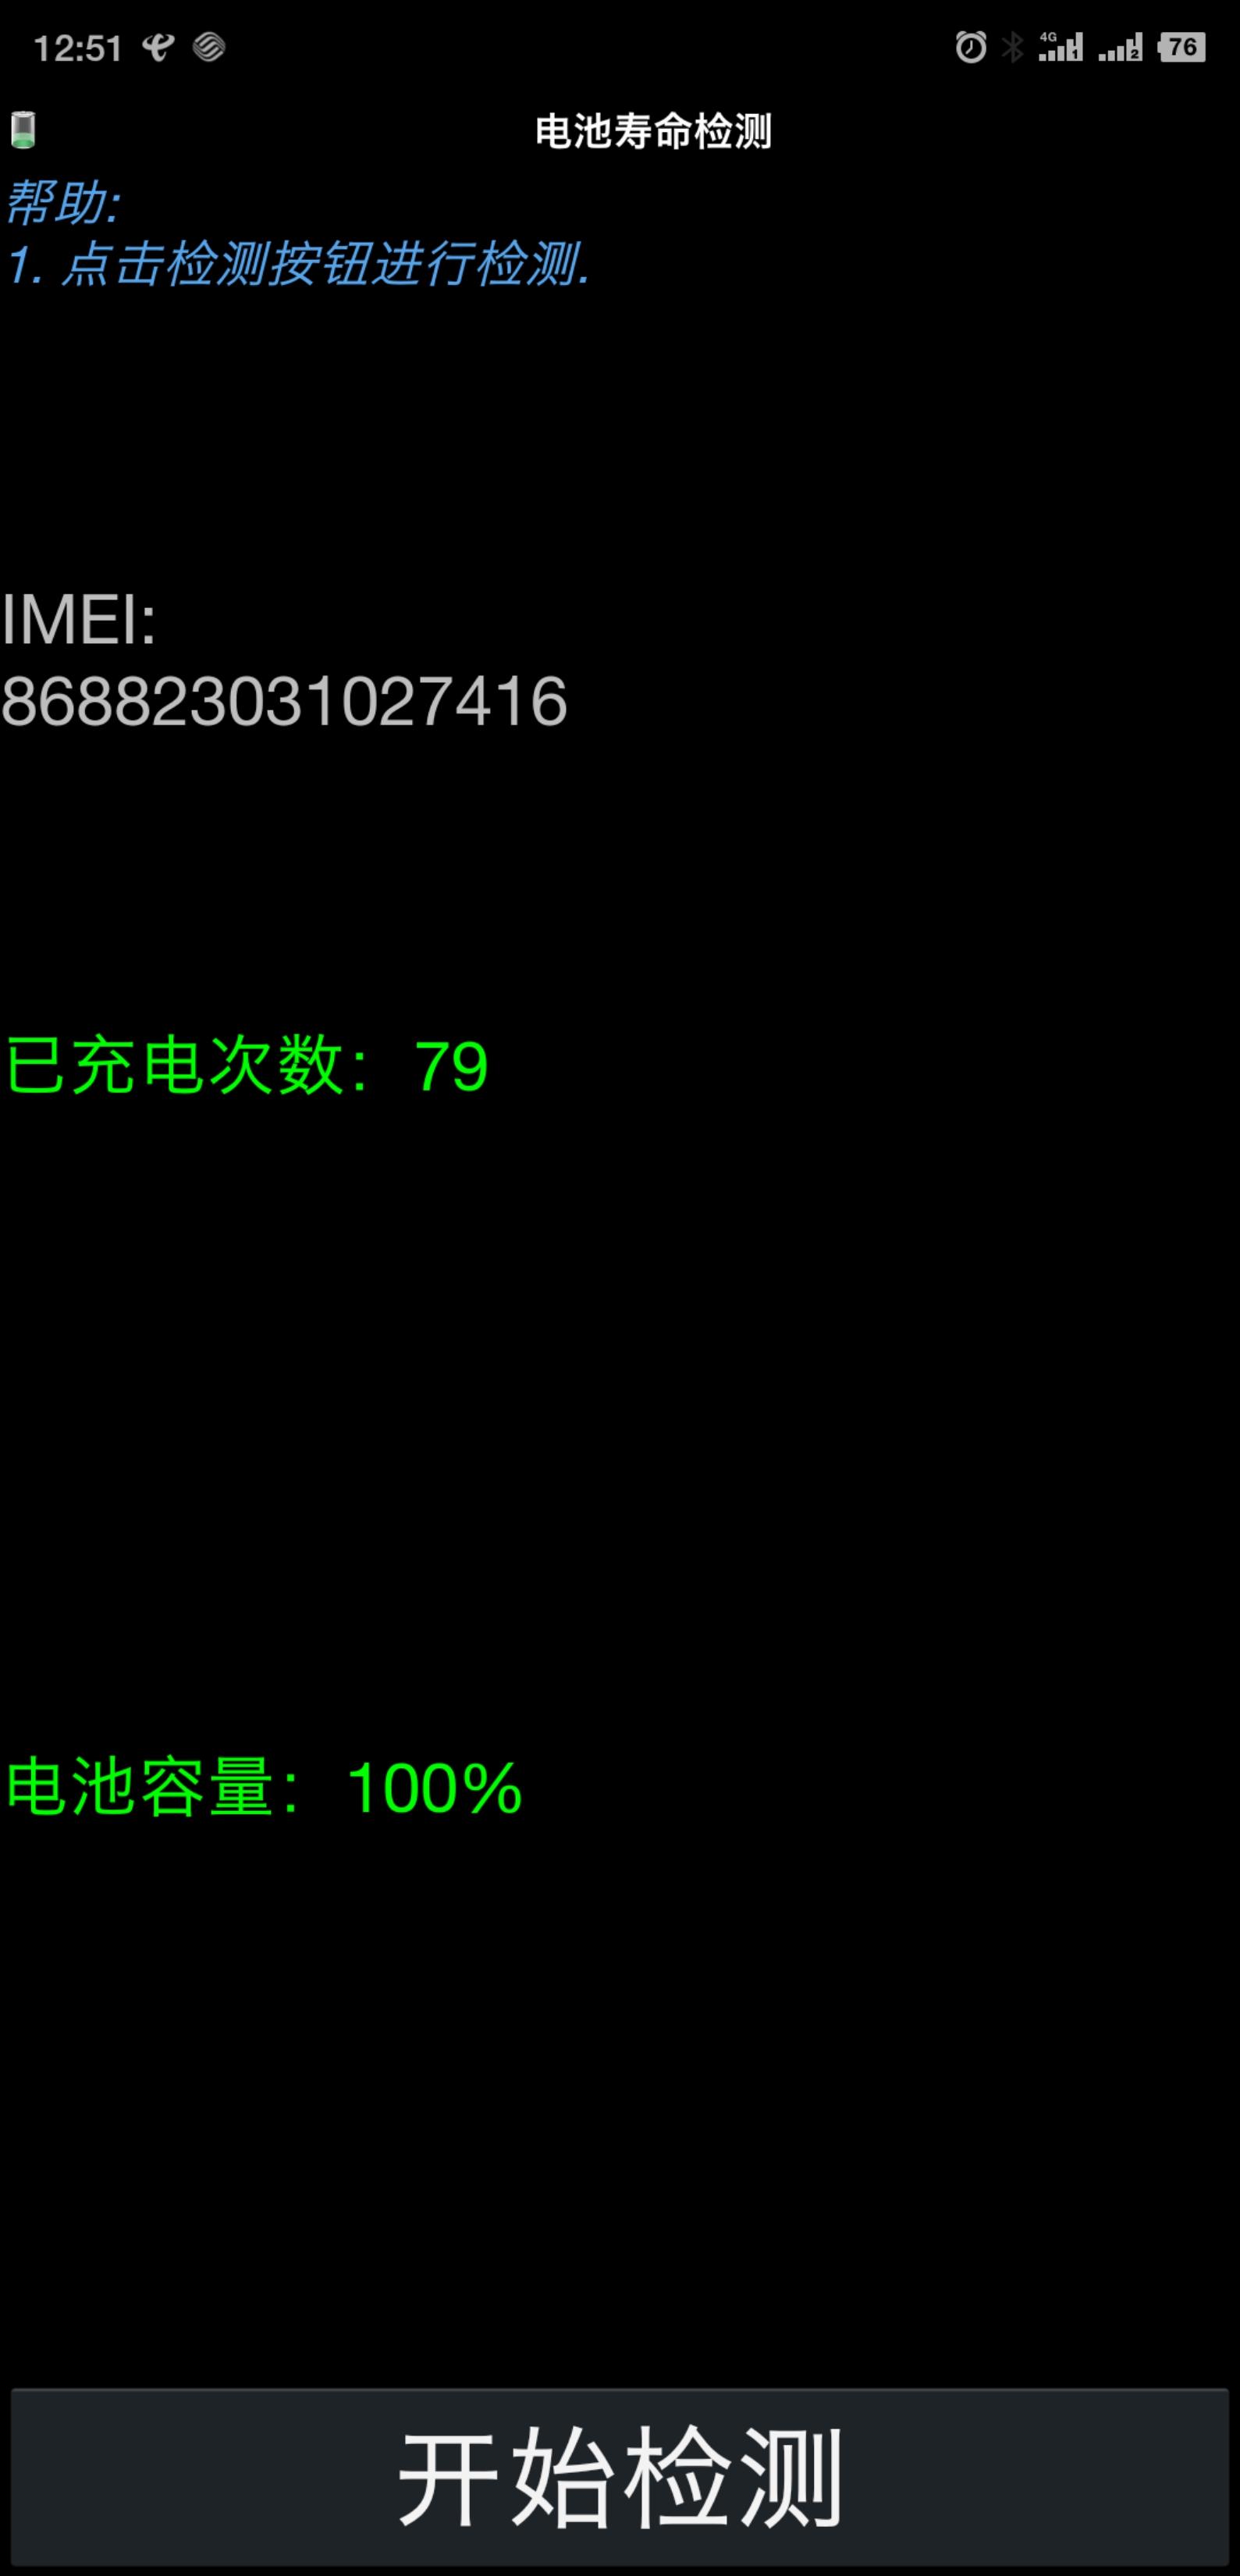 Screenshot_2018-10-26-12-51-05-007.png